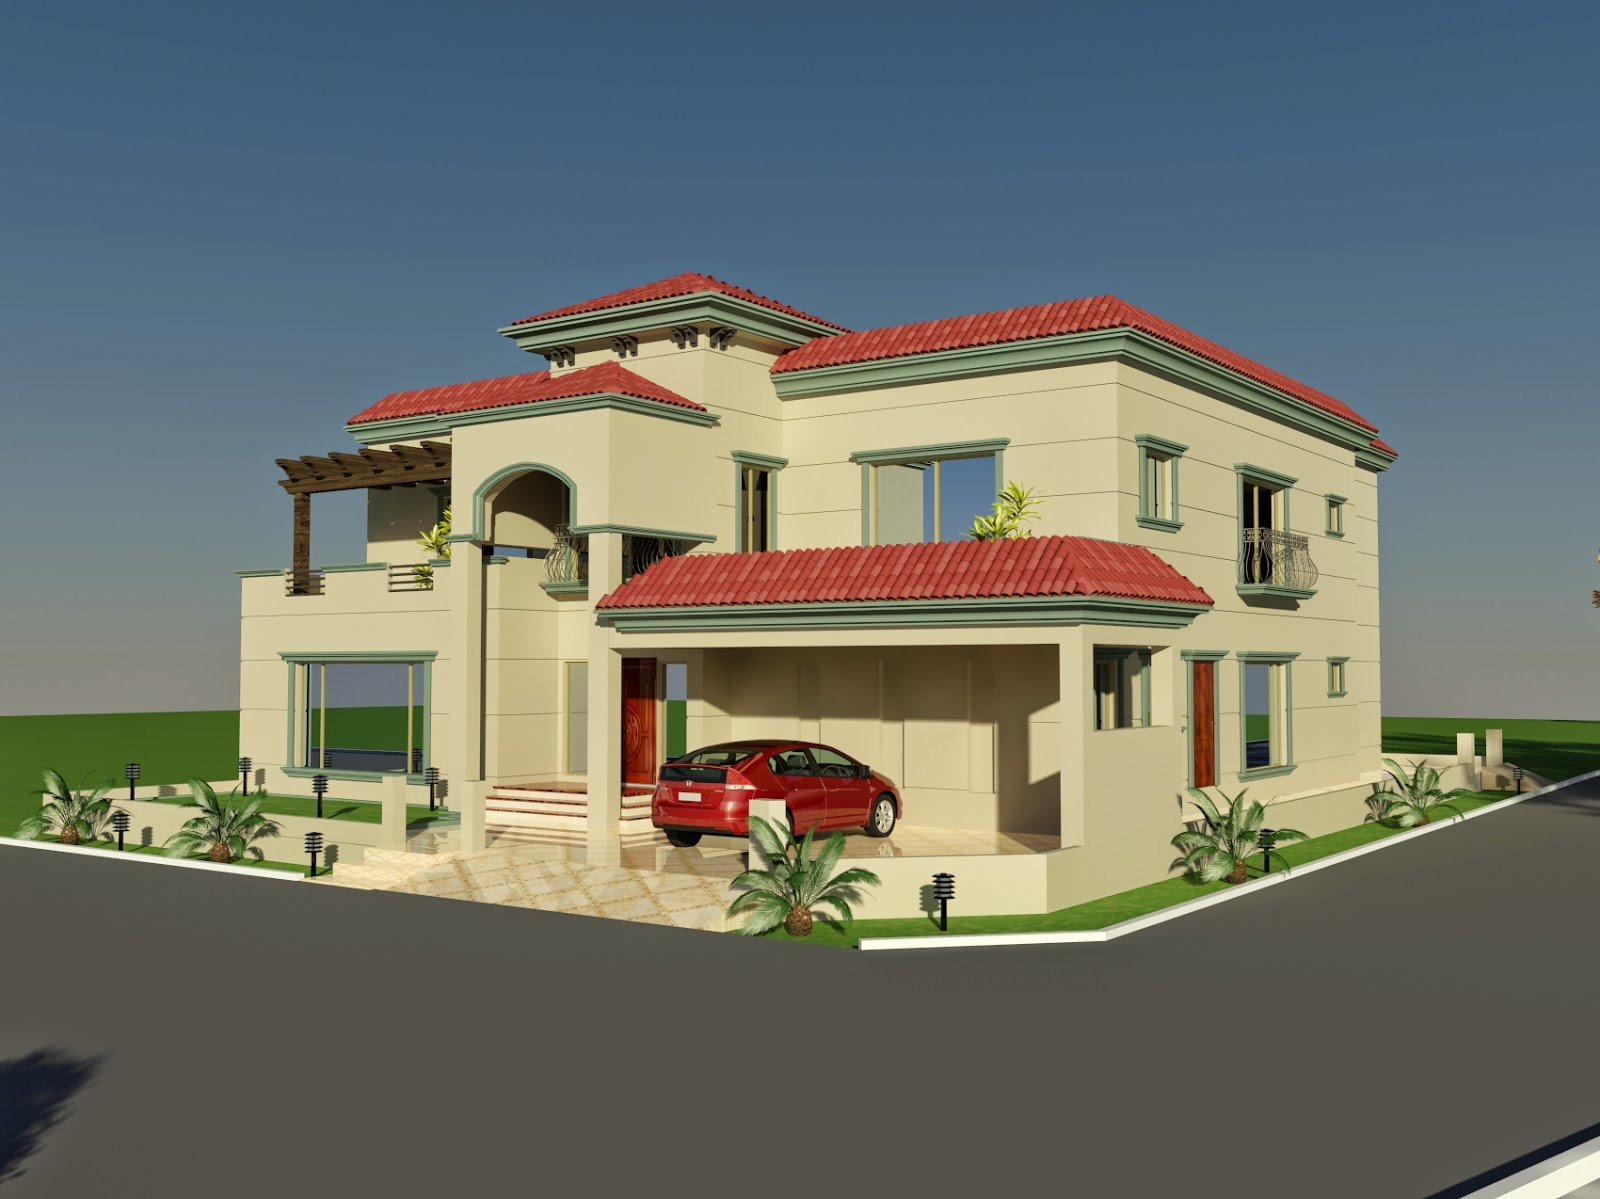 3d front elevation of house good decorating ideas. Black Bedroom Furniture Sets. Home Design Ideas